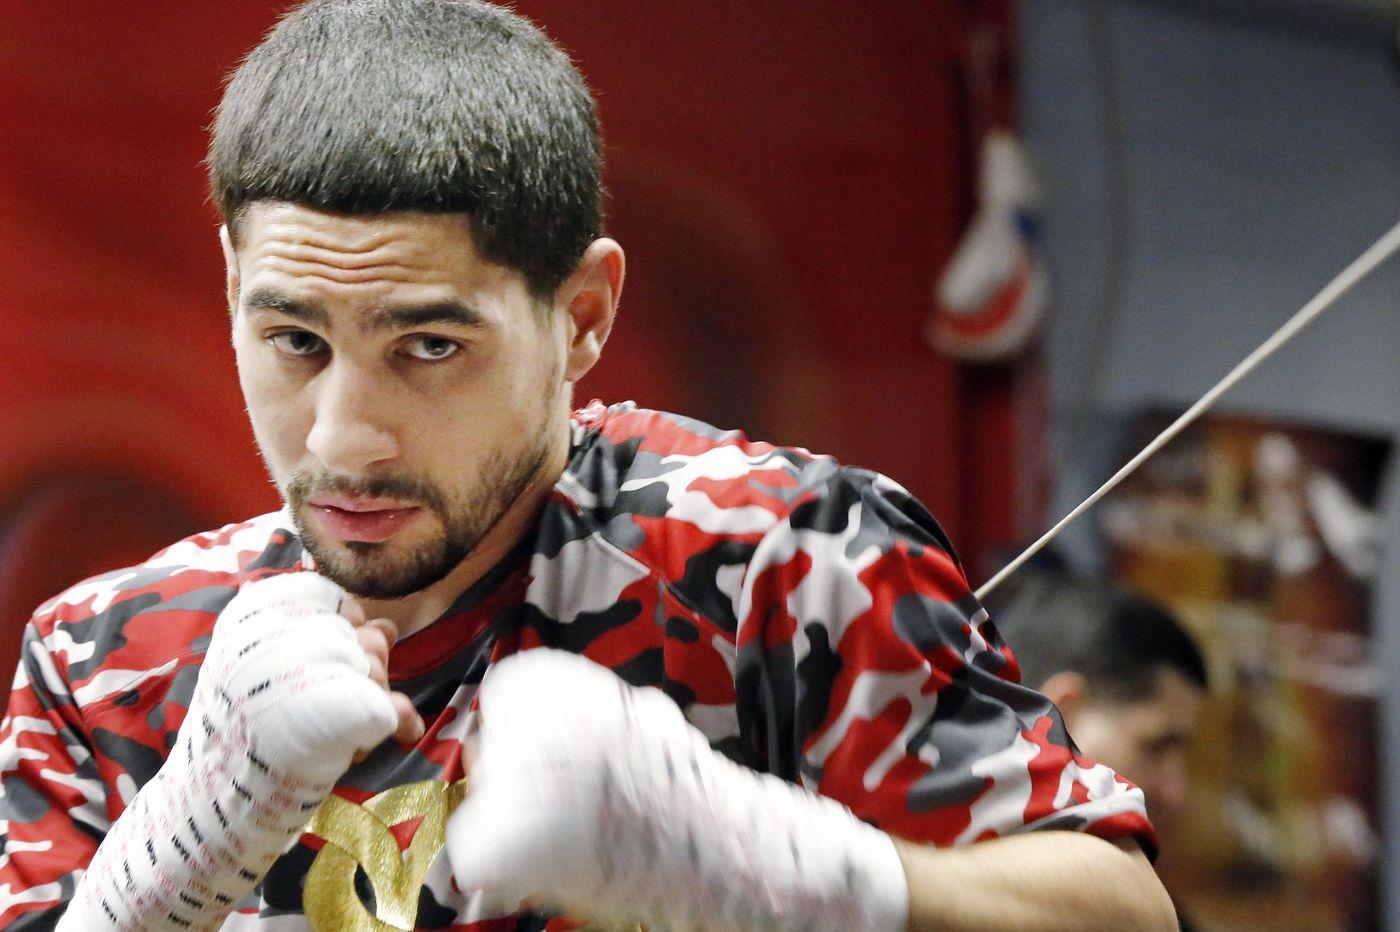 Danny Garcia loses unanimous decision to Shawn Porter